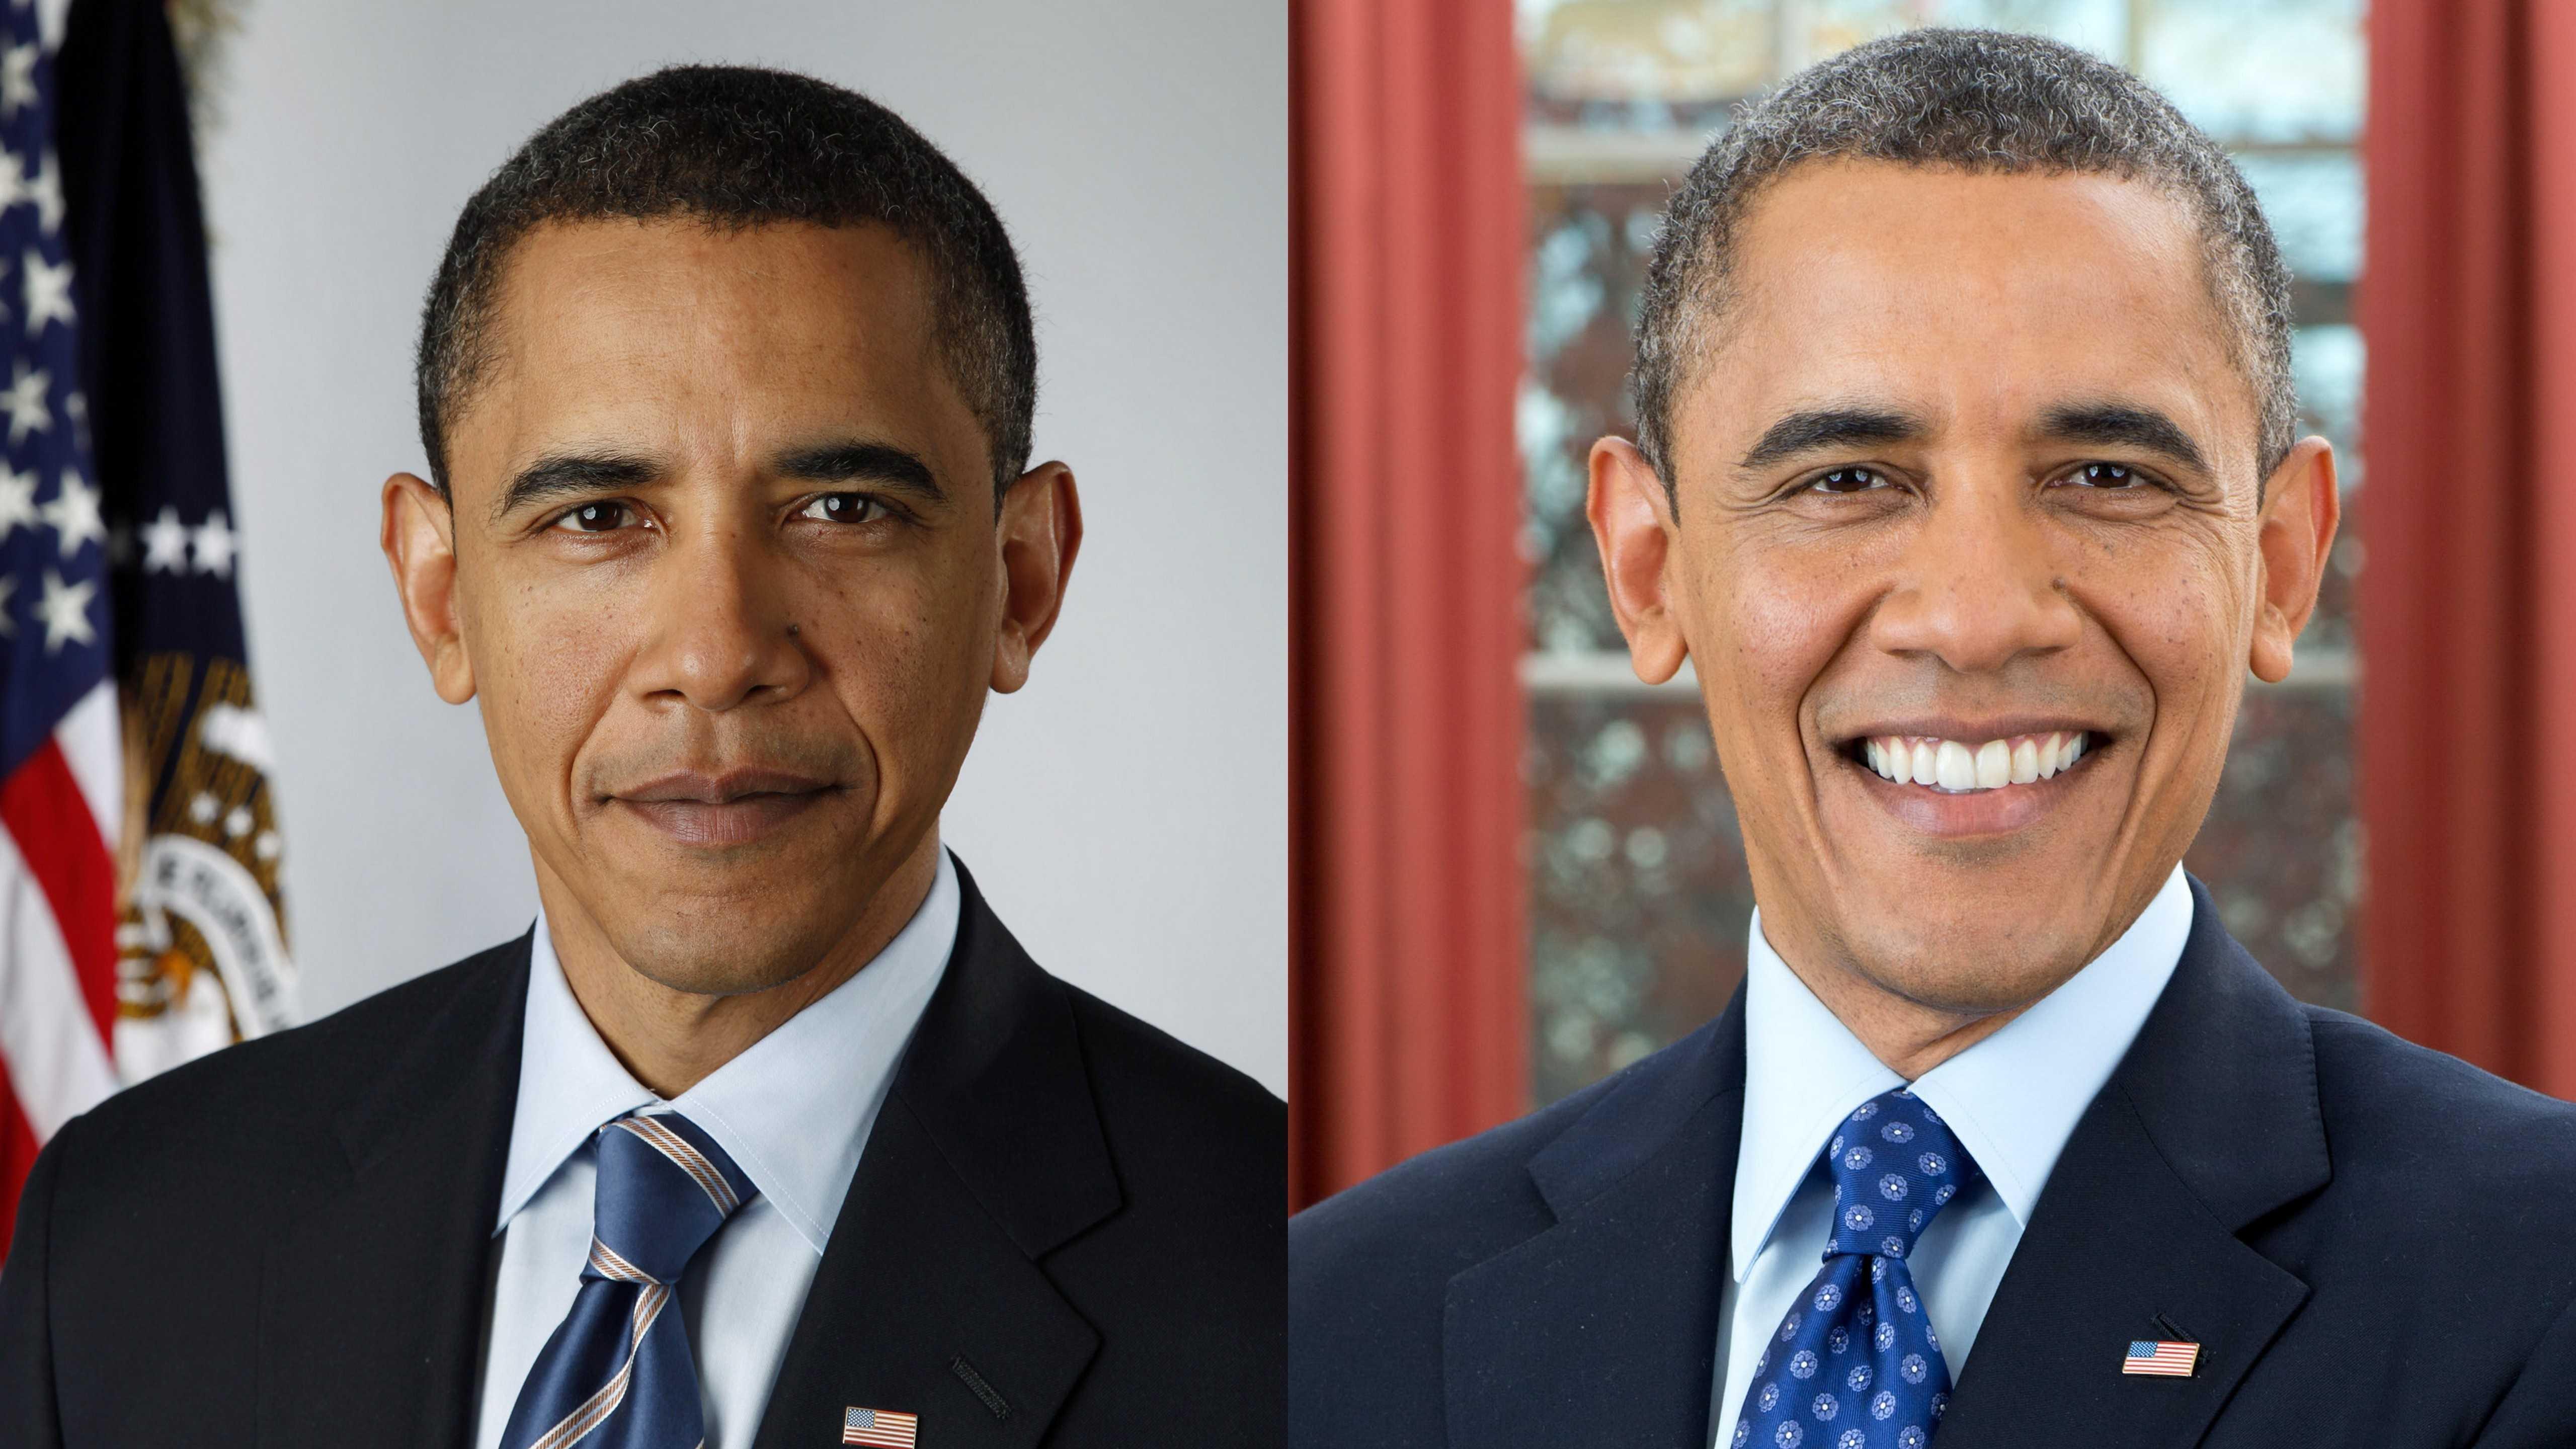 Obama 1st & 2nd Term Photo.jpg